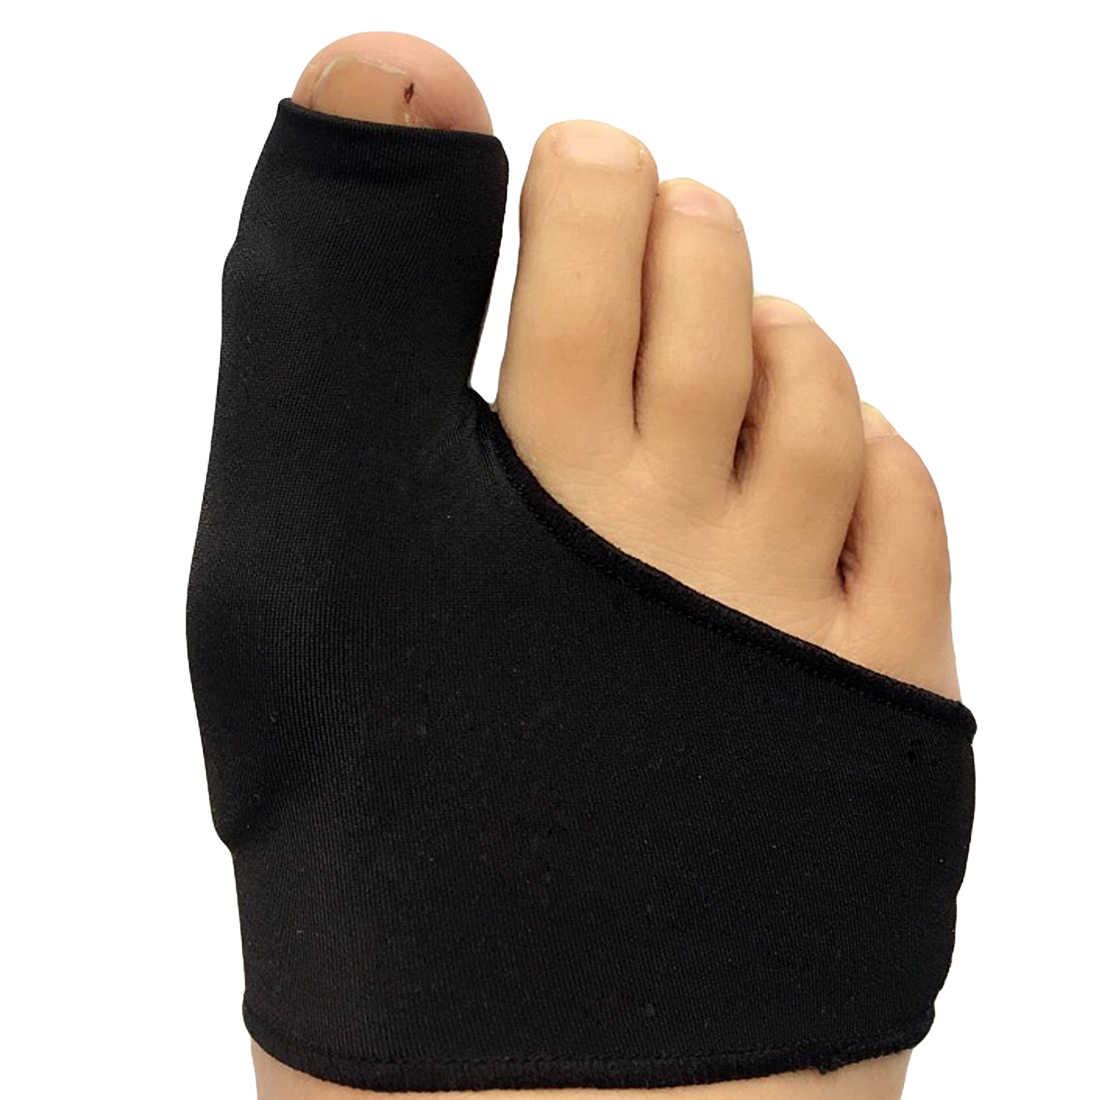 Bunion 파우치 교정 팔꿈치 발굽 통증 세트 발가락 분리기 발 뼈 엄지 교정 교정 페디큐어 양말 스트레이트 너